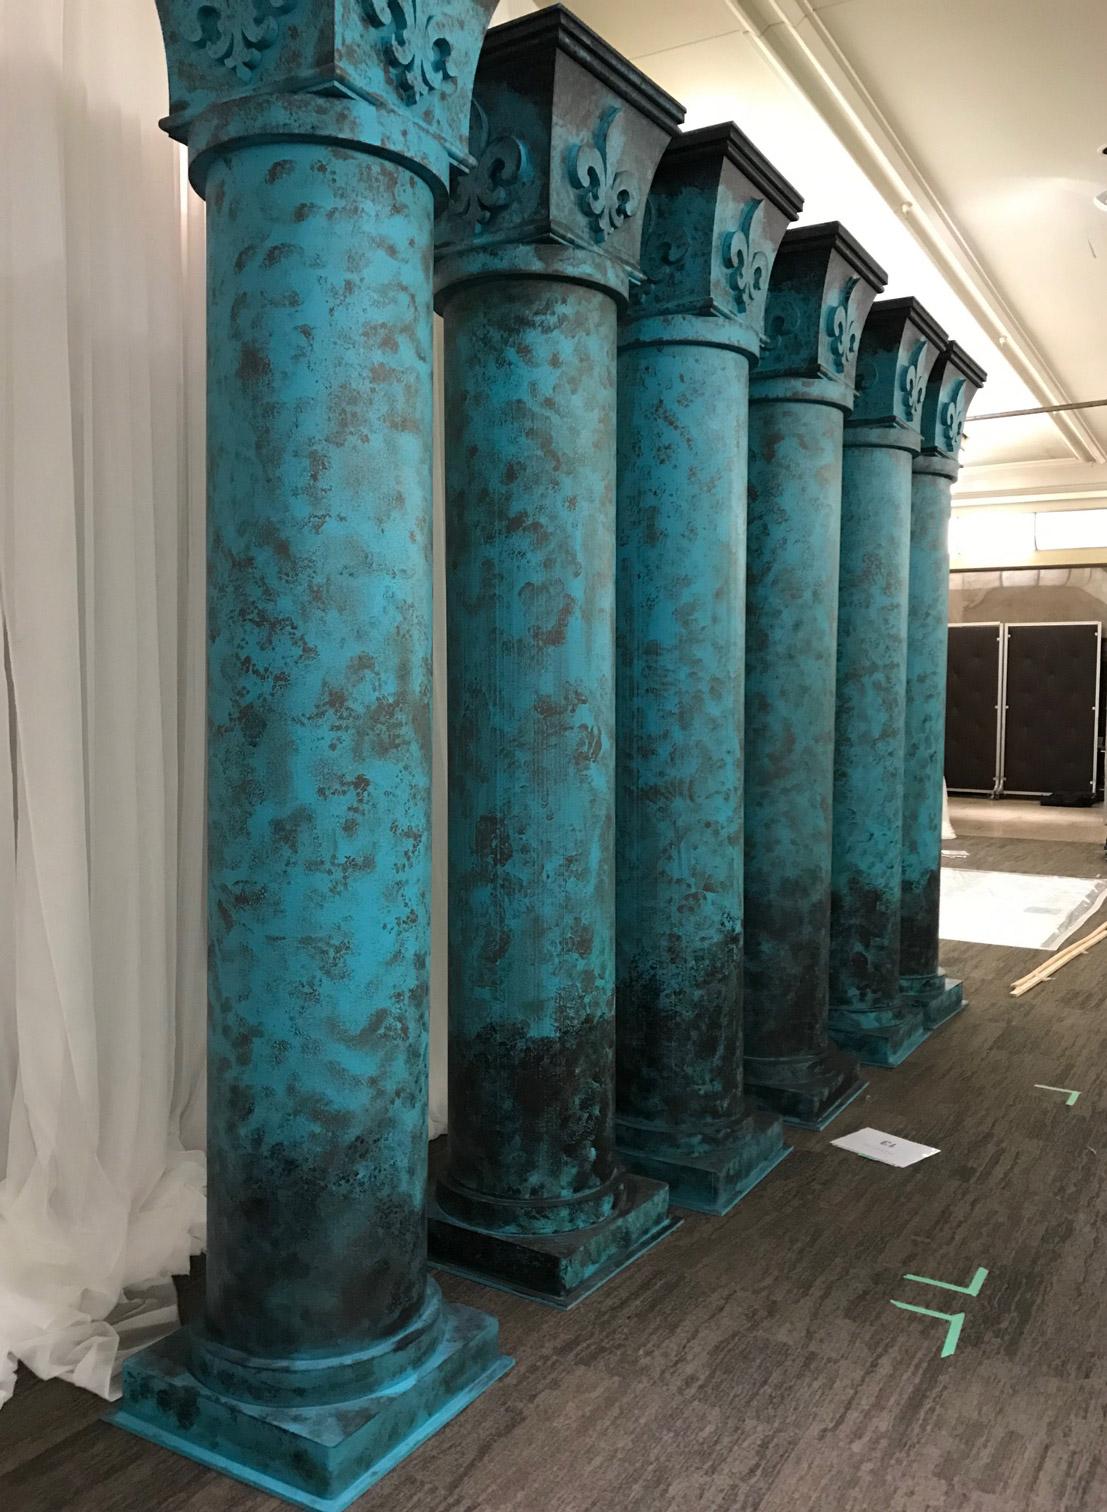 Styrofoam pillars